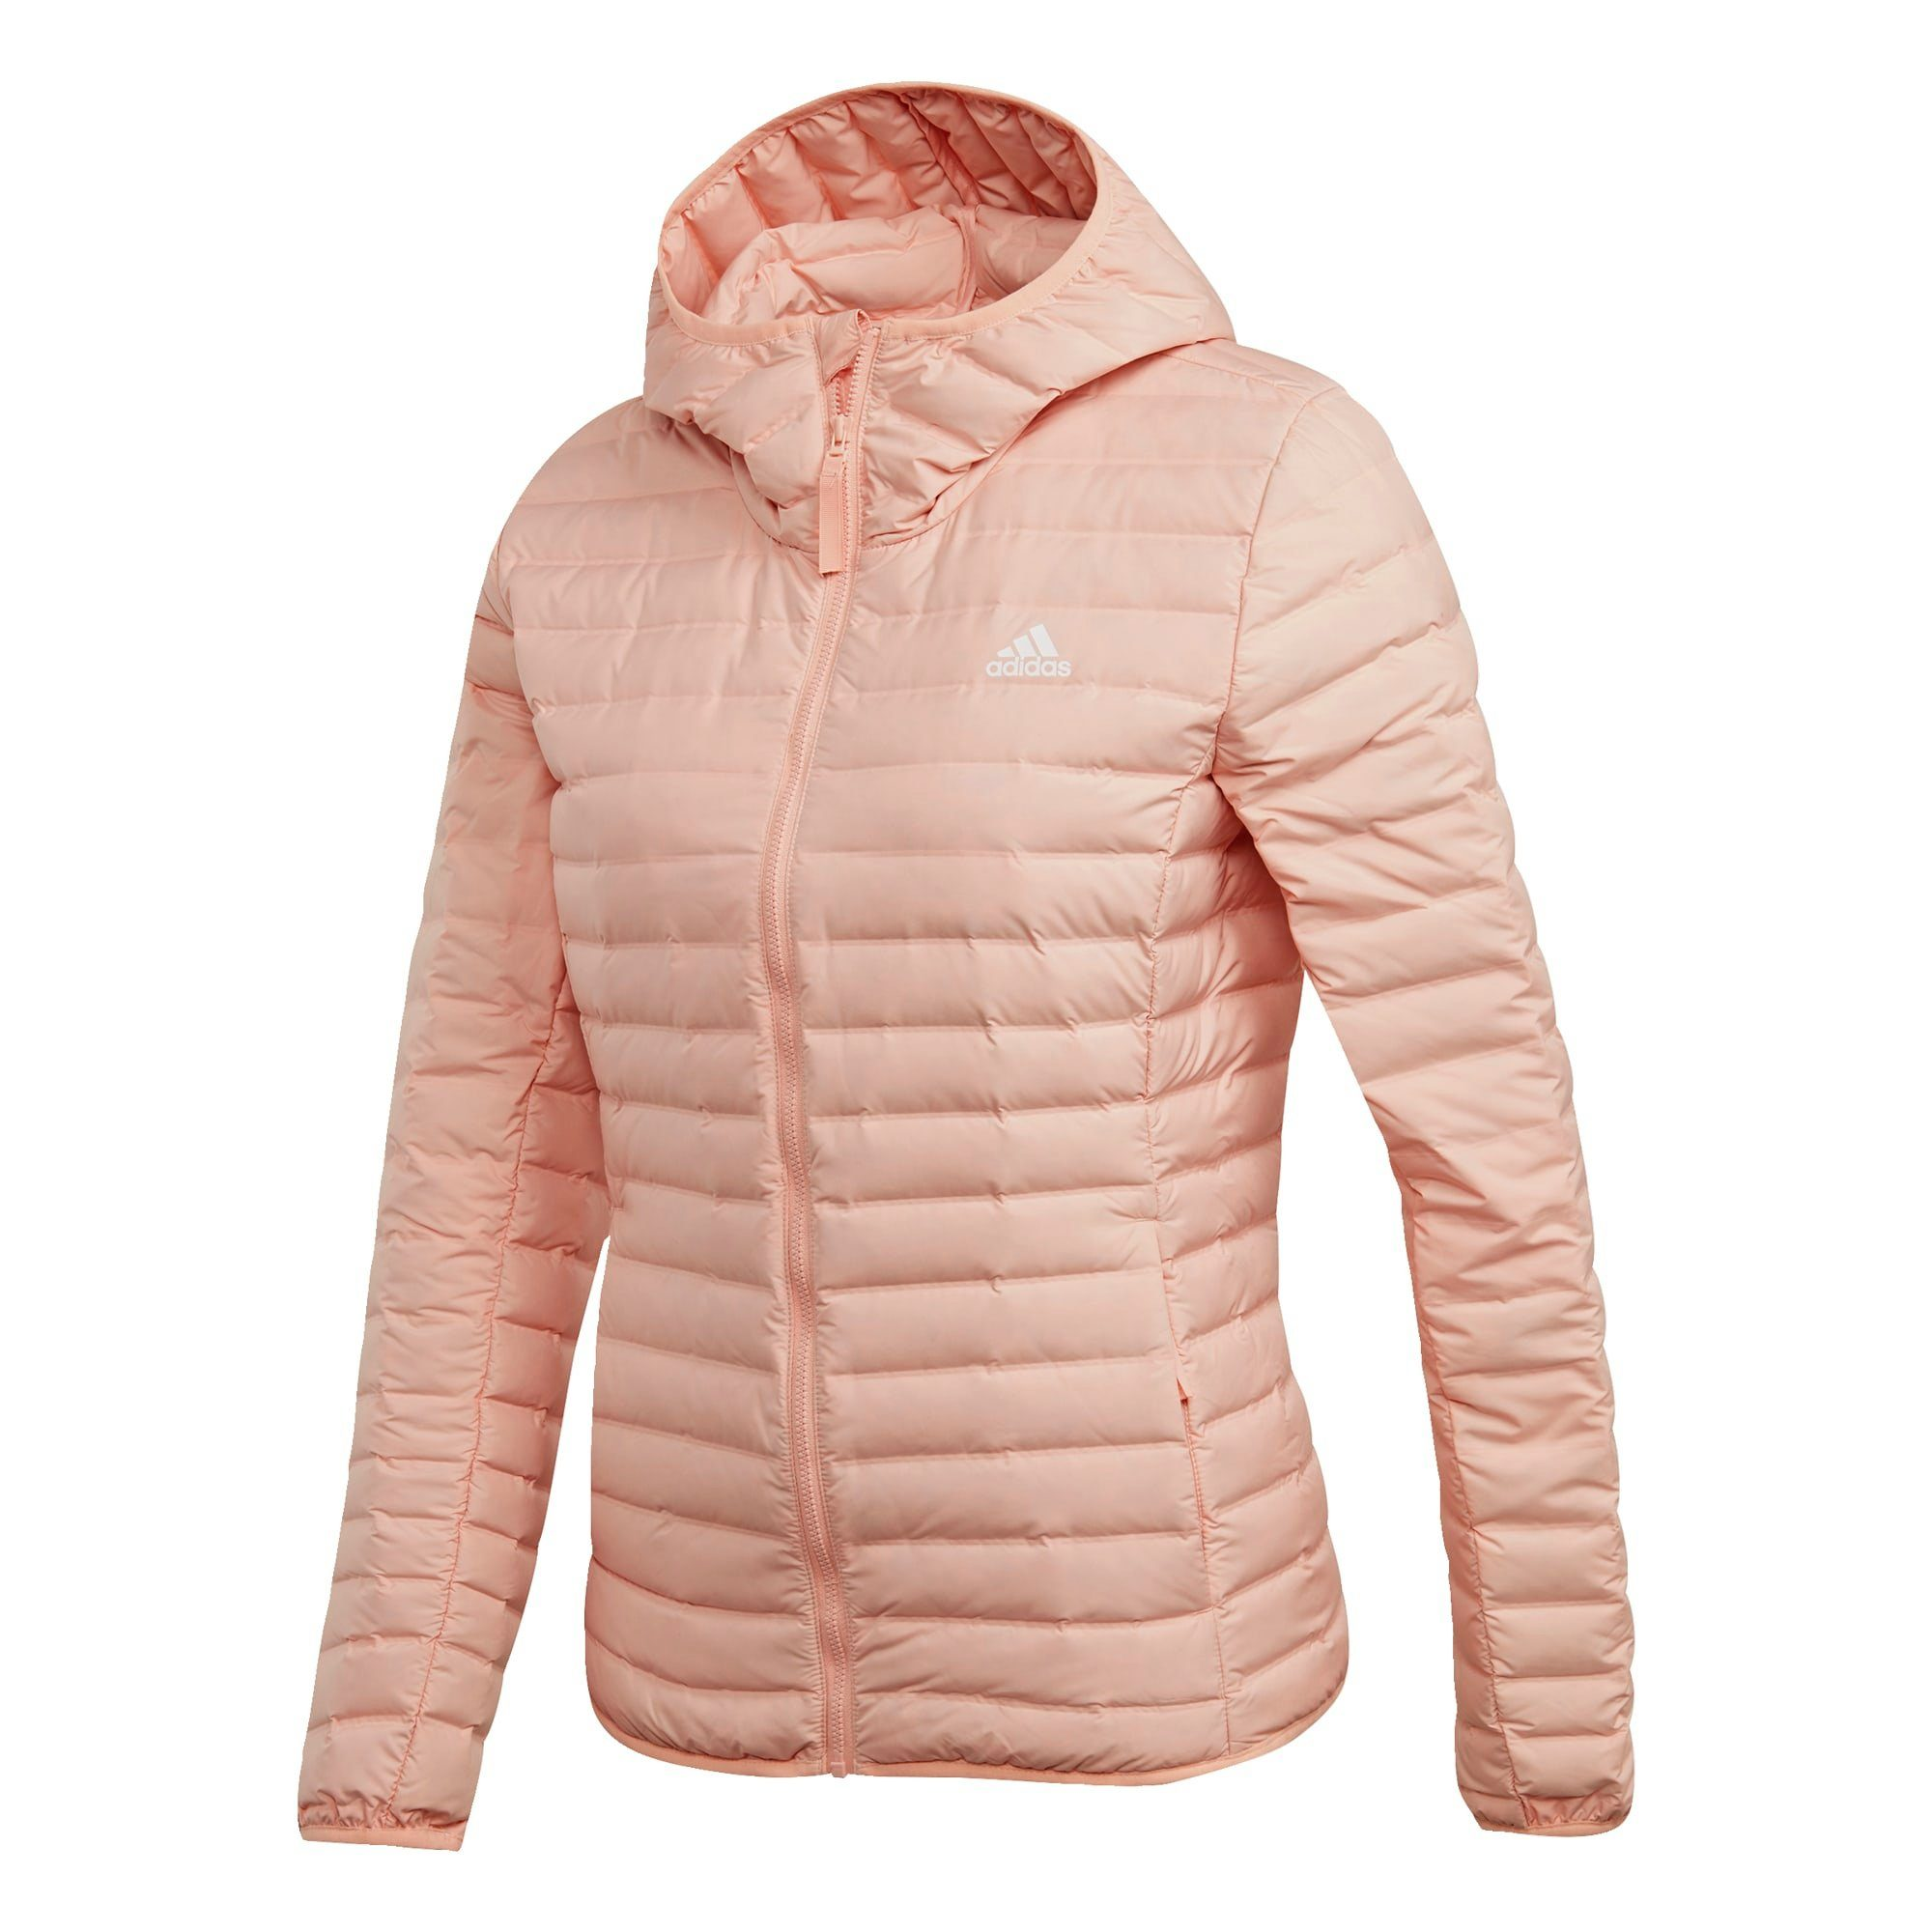 adidas Performance Funktionsjacke »Varilite Soft Hooded Jacke« online kaufen | OTTO